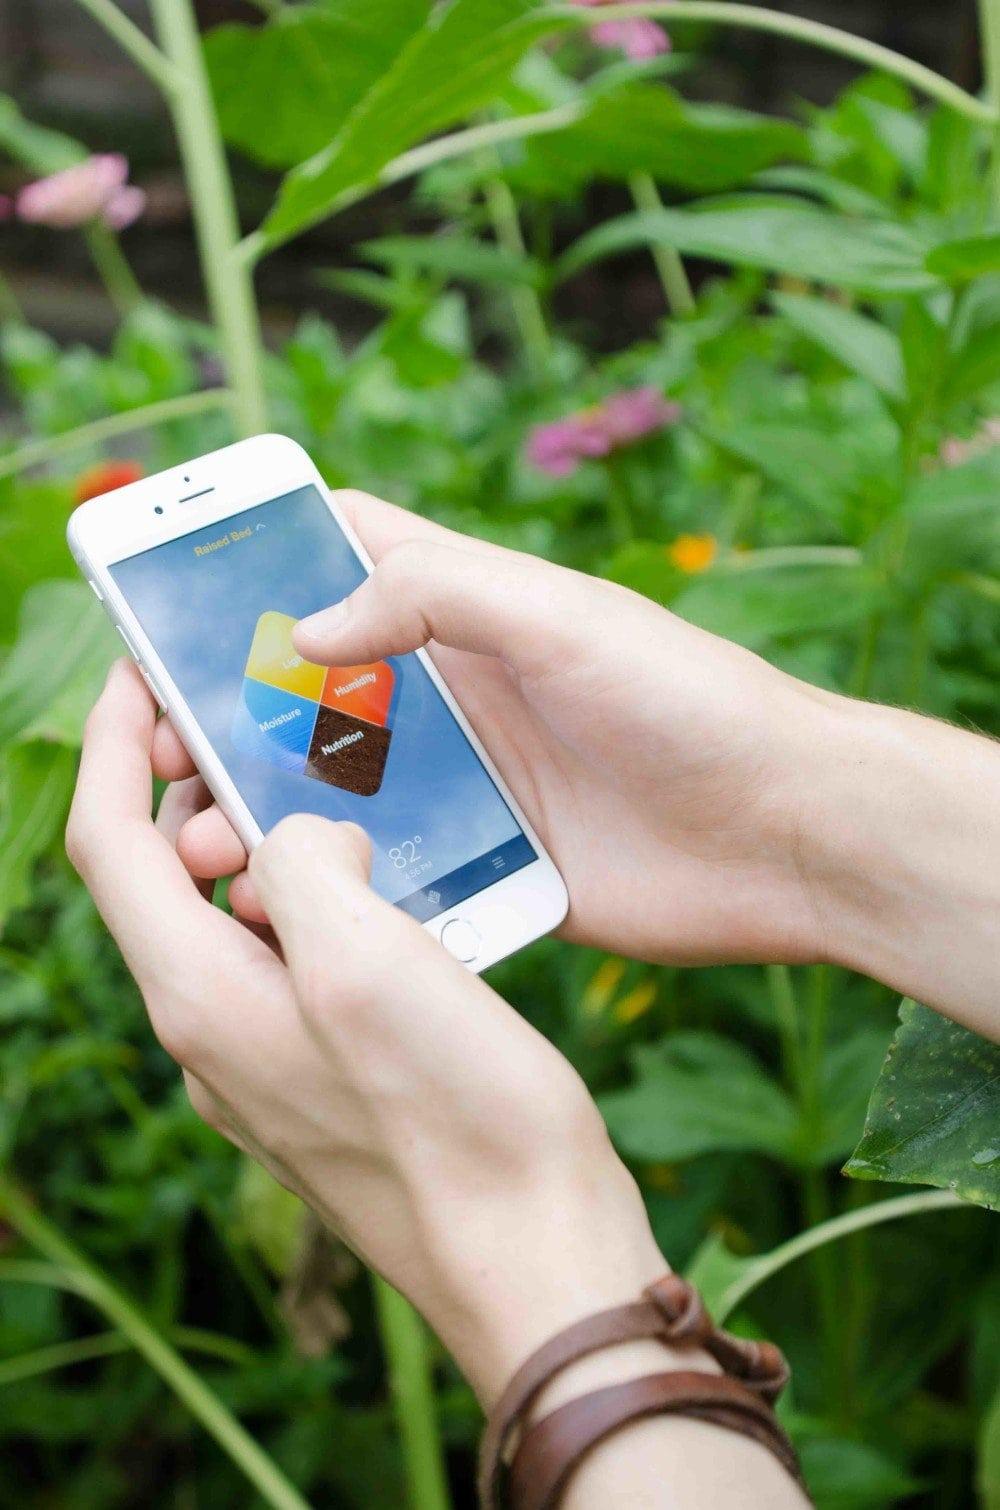 Edyn garden sensor technology that will change the way you work in the garden.